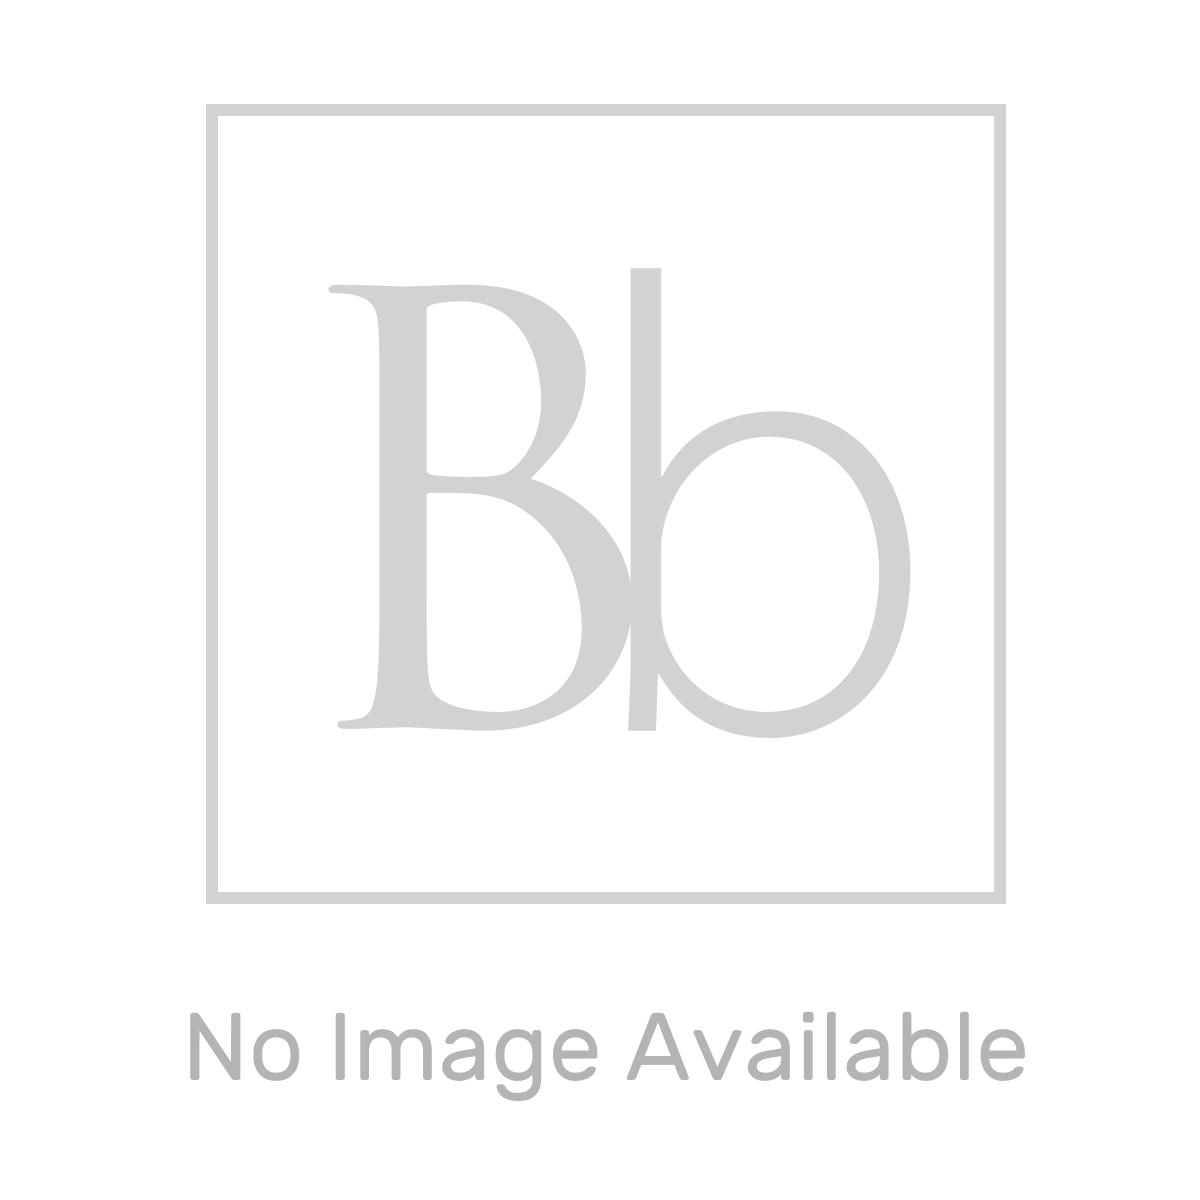 Aquadart Grey Slate Shower Tray 1700 x 900